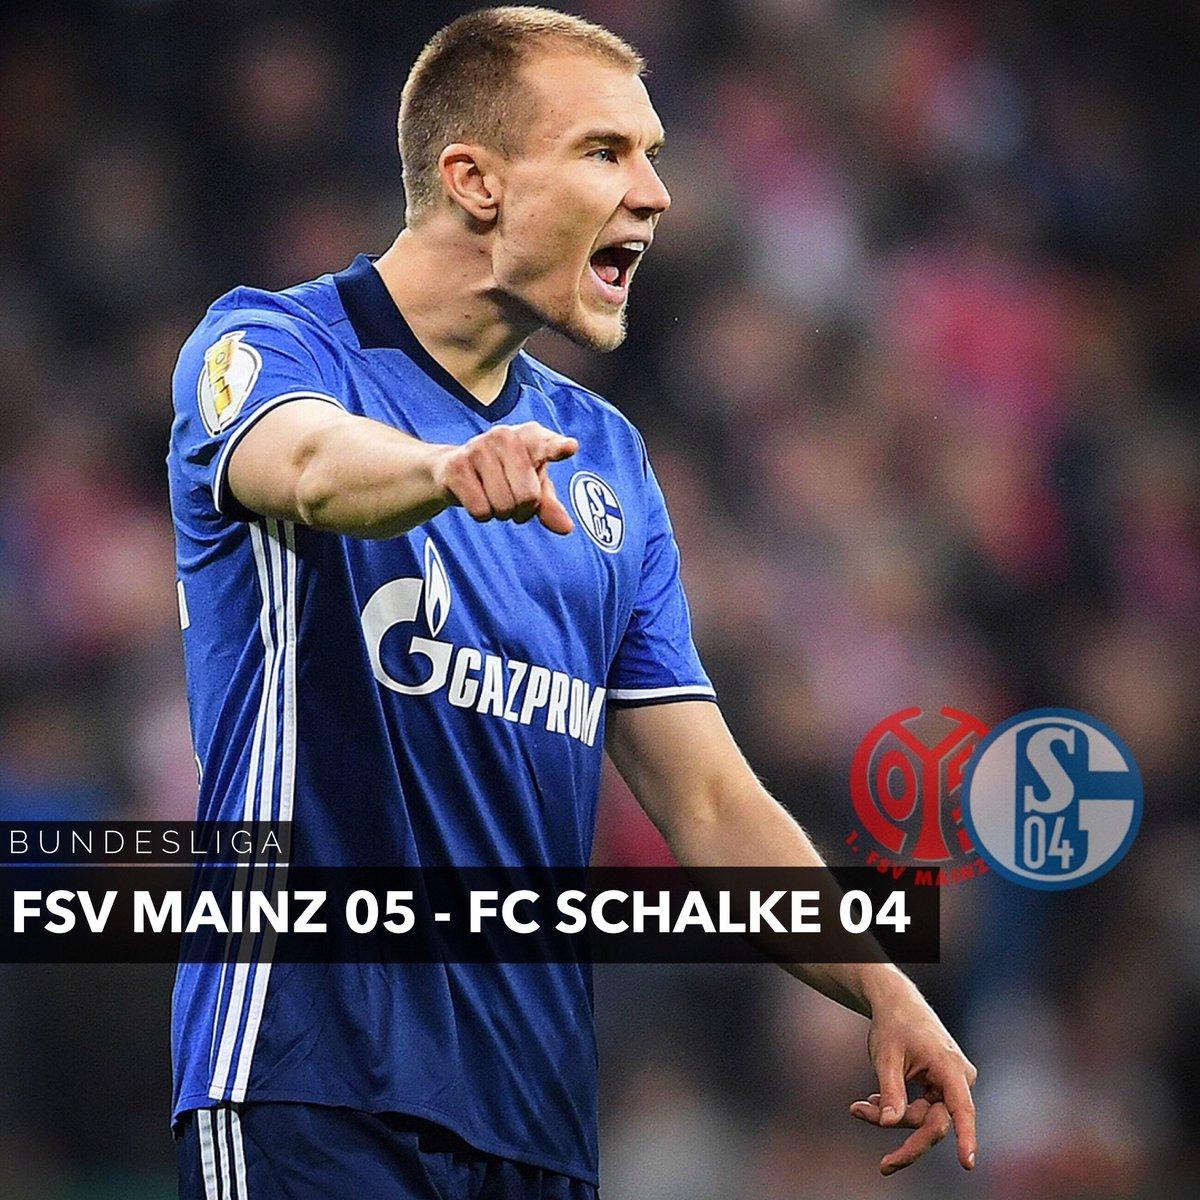 Matchday! 👊 #M05S04 #Bundesliga https://t.co/78UwGJK00S